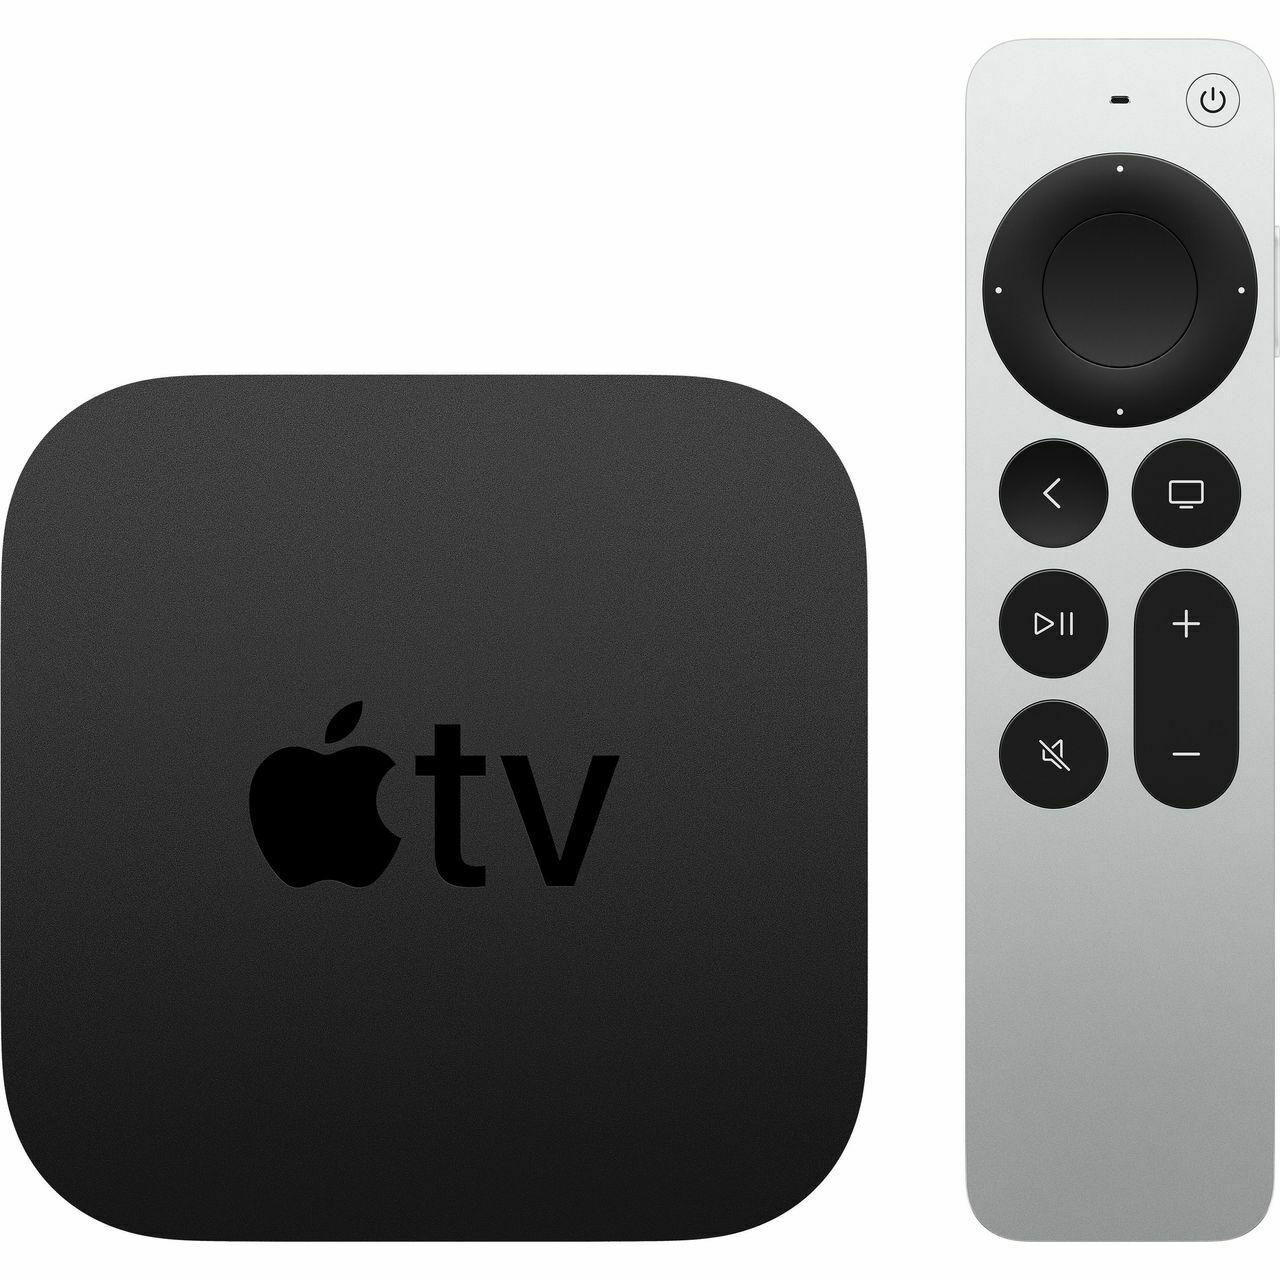 Apple TV 4K Smart Box 64GB WiFi Netflix BBC iPlayer - Black New - £151.20 delivered using code @ AO / eBay (UK Mainland)